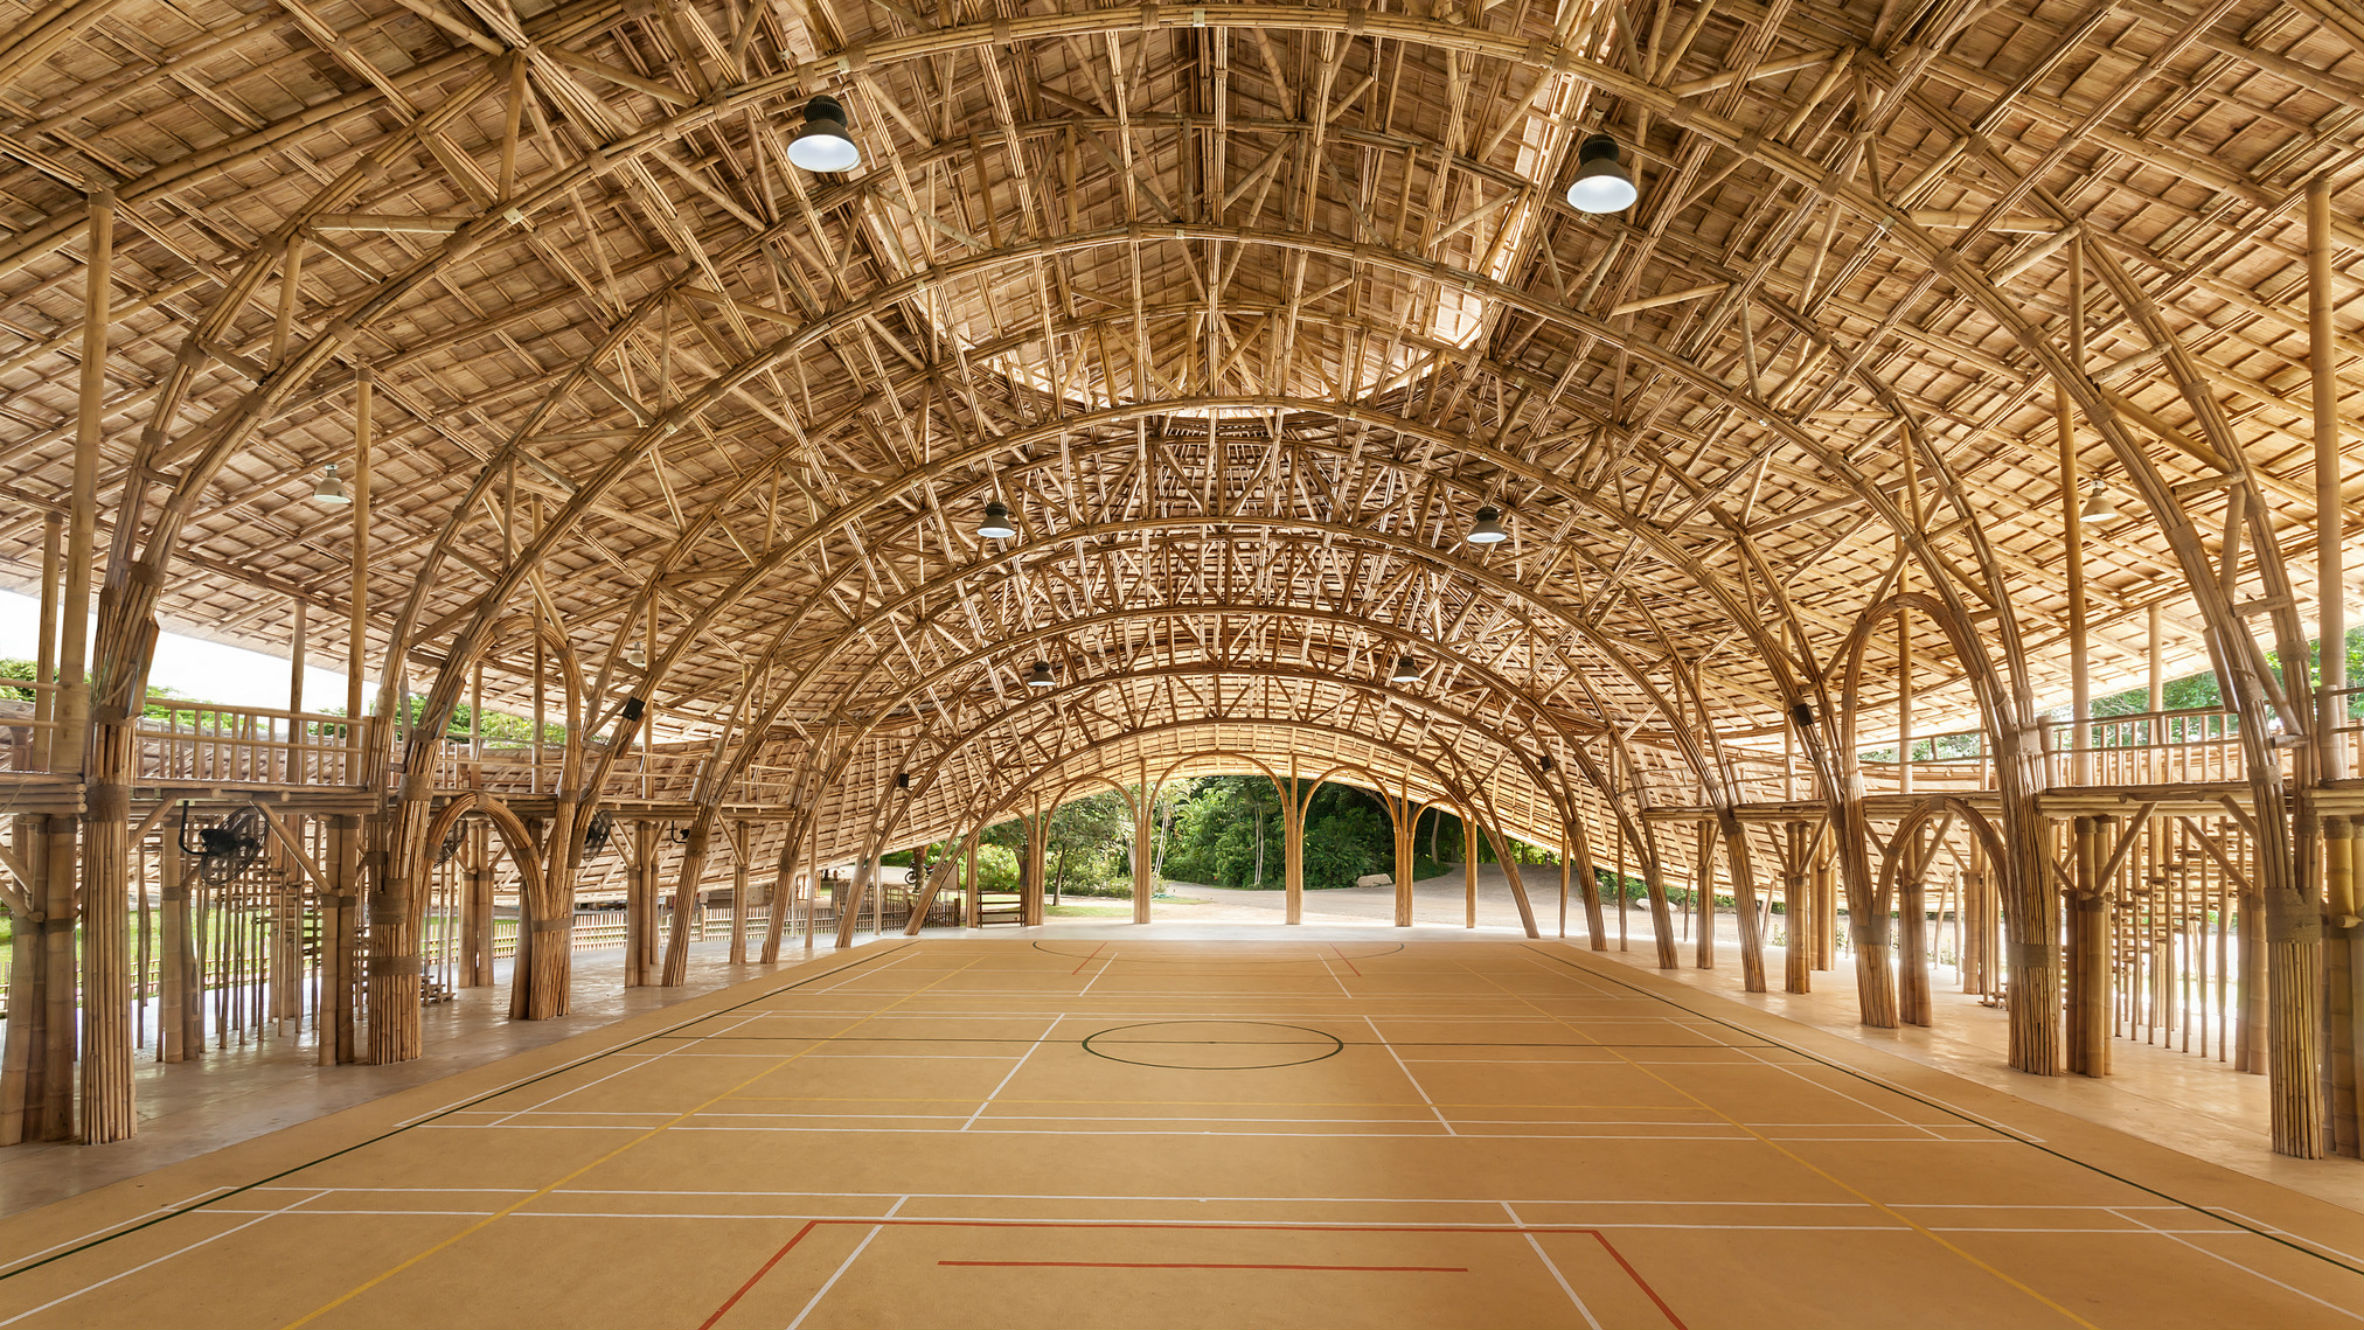 Bamboo Sports Hall, Chiang Mai, Thailand, by Chiangmai Life Architects